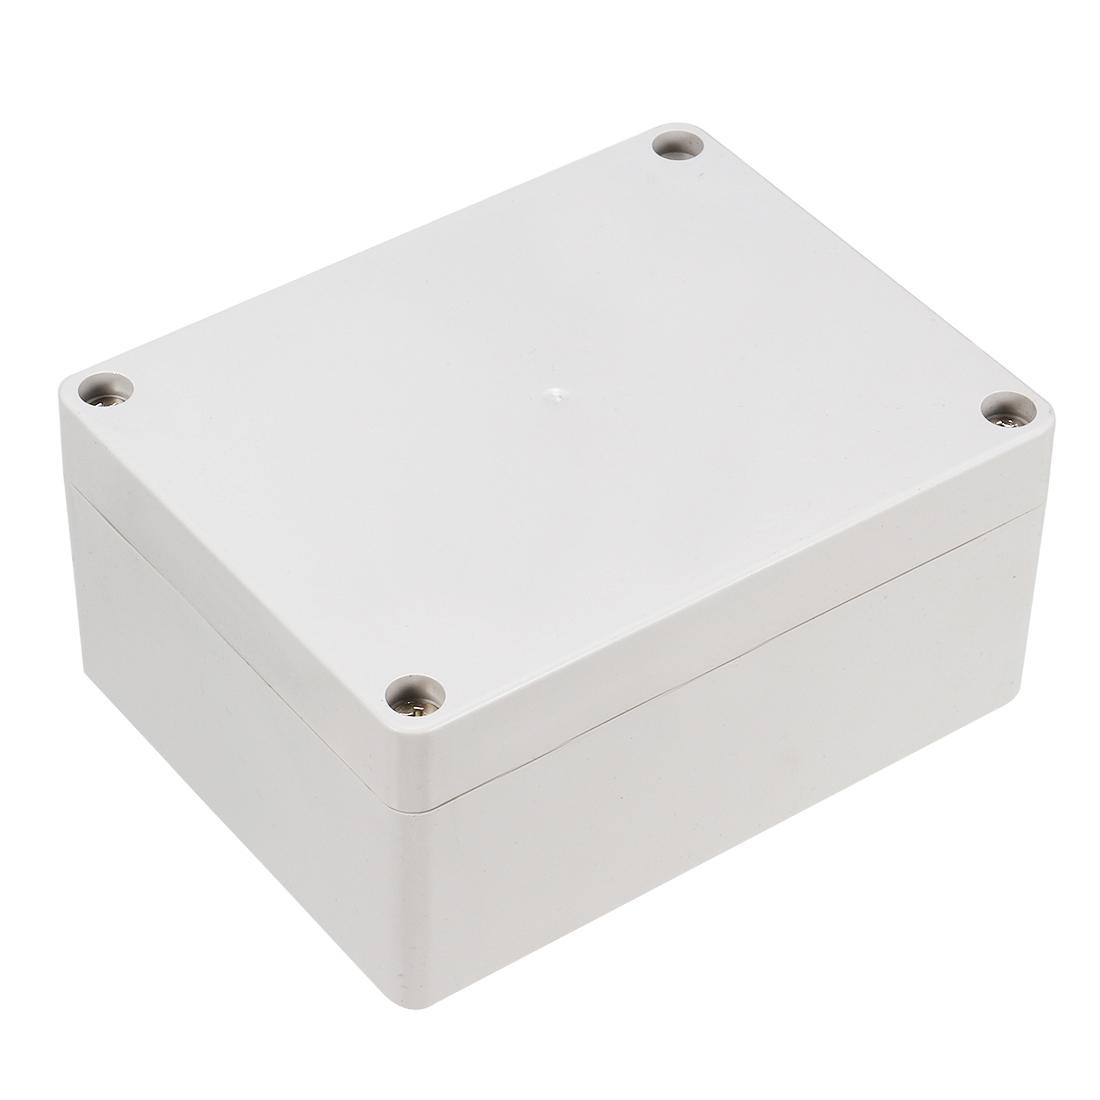 Dustproof IP65 Plastic Electronic Enclosure Project Case Junction Box 115mmx90mmx55mm